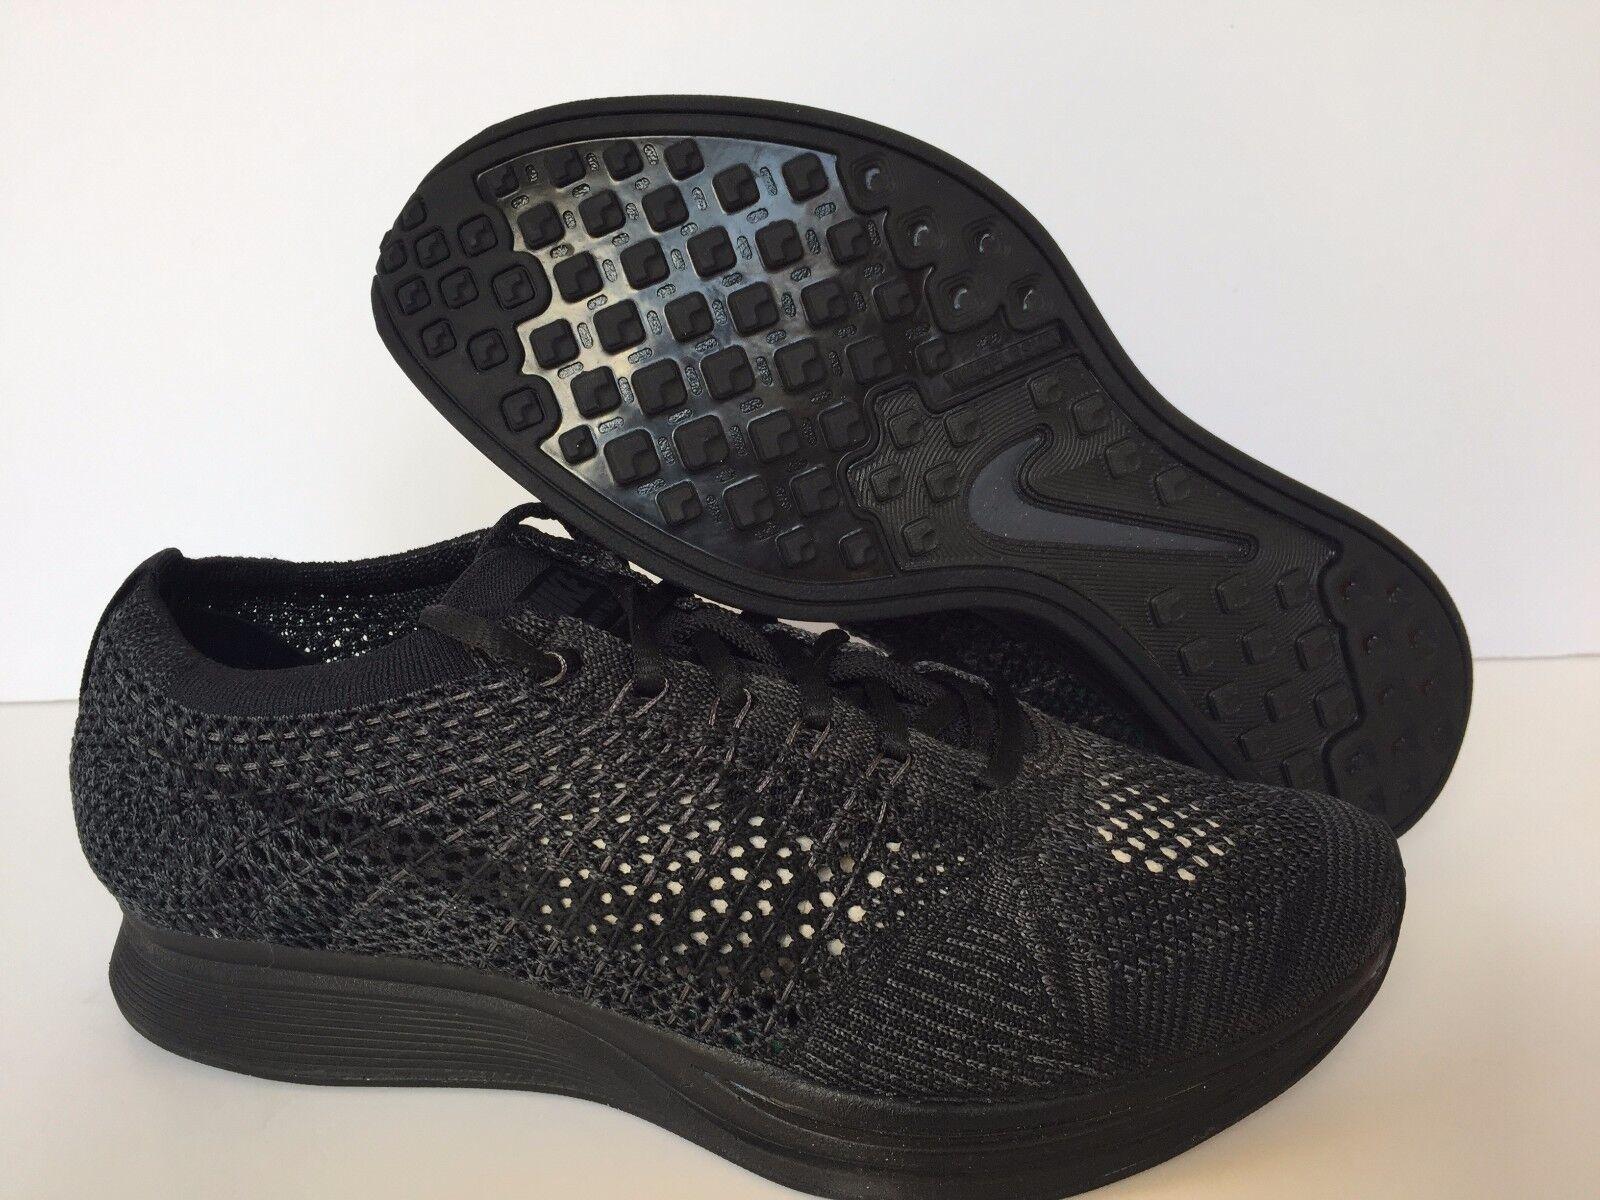 Nike Flyknit Racer Triple Black Anthracite [526628-009] SIZE MEN 5.5 WOMEN 7